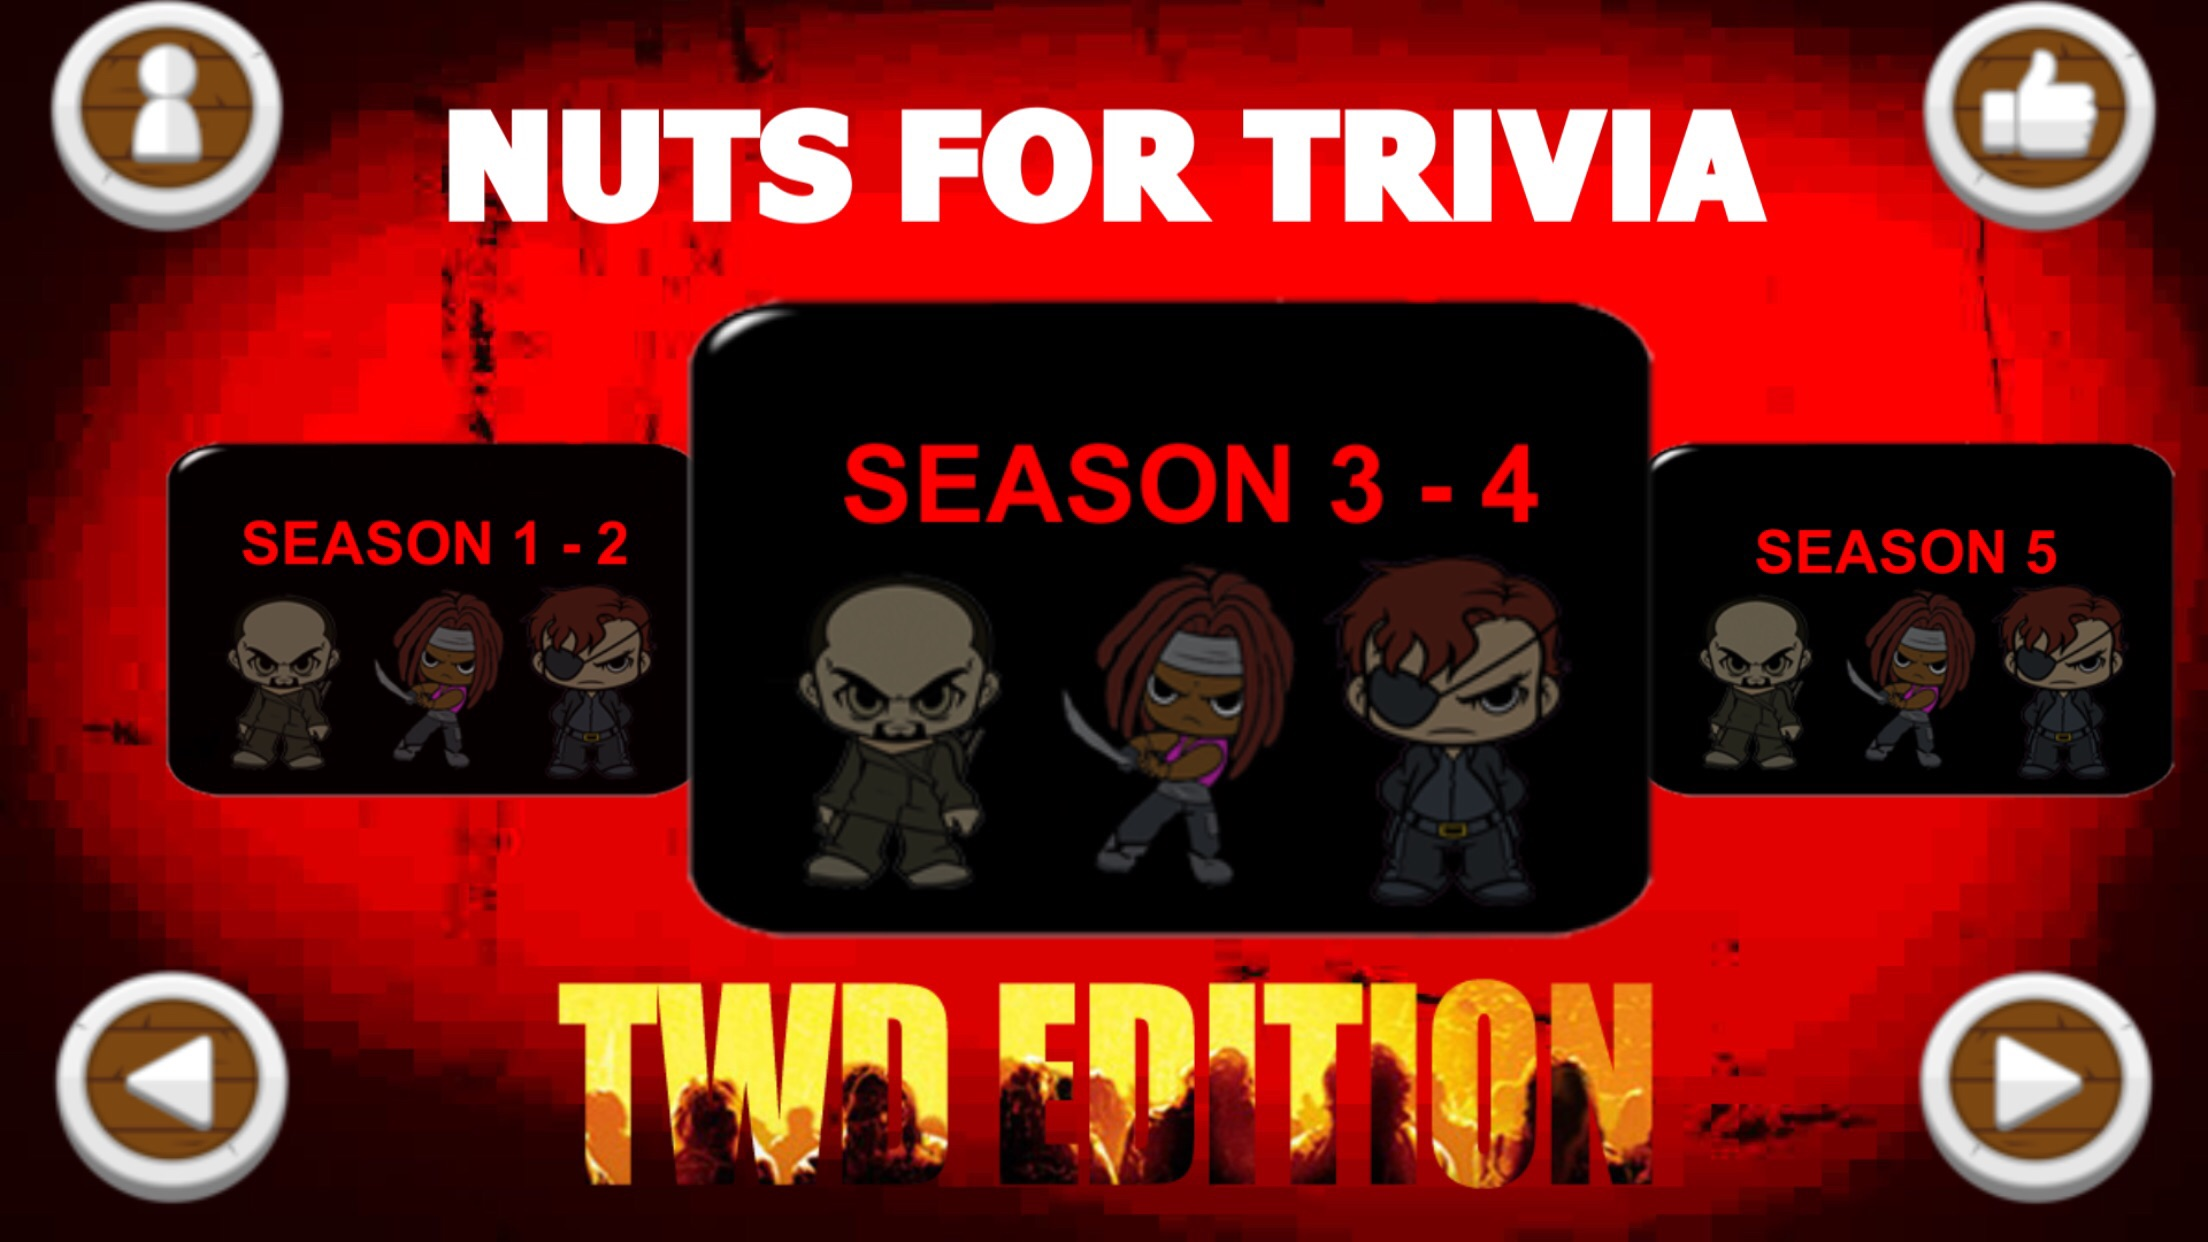 nuts for trivia walking dead